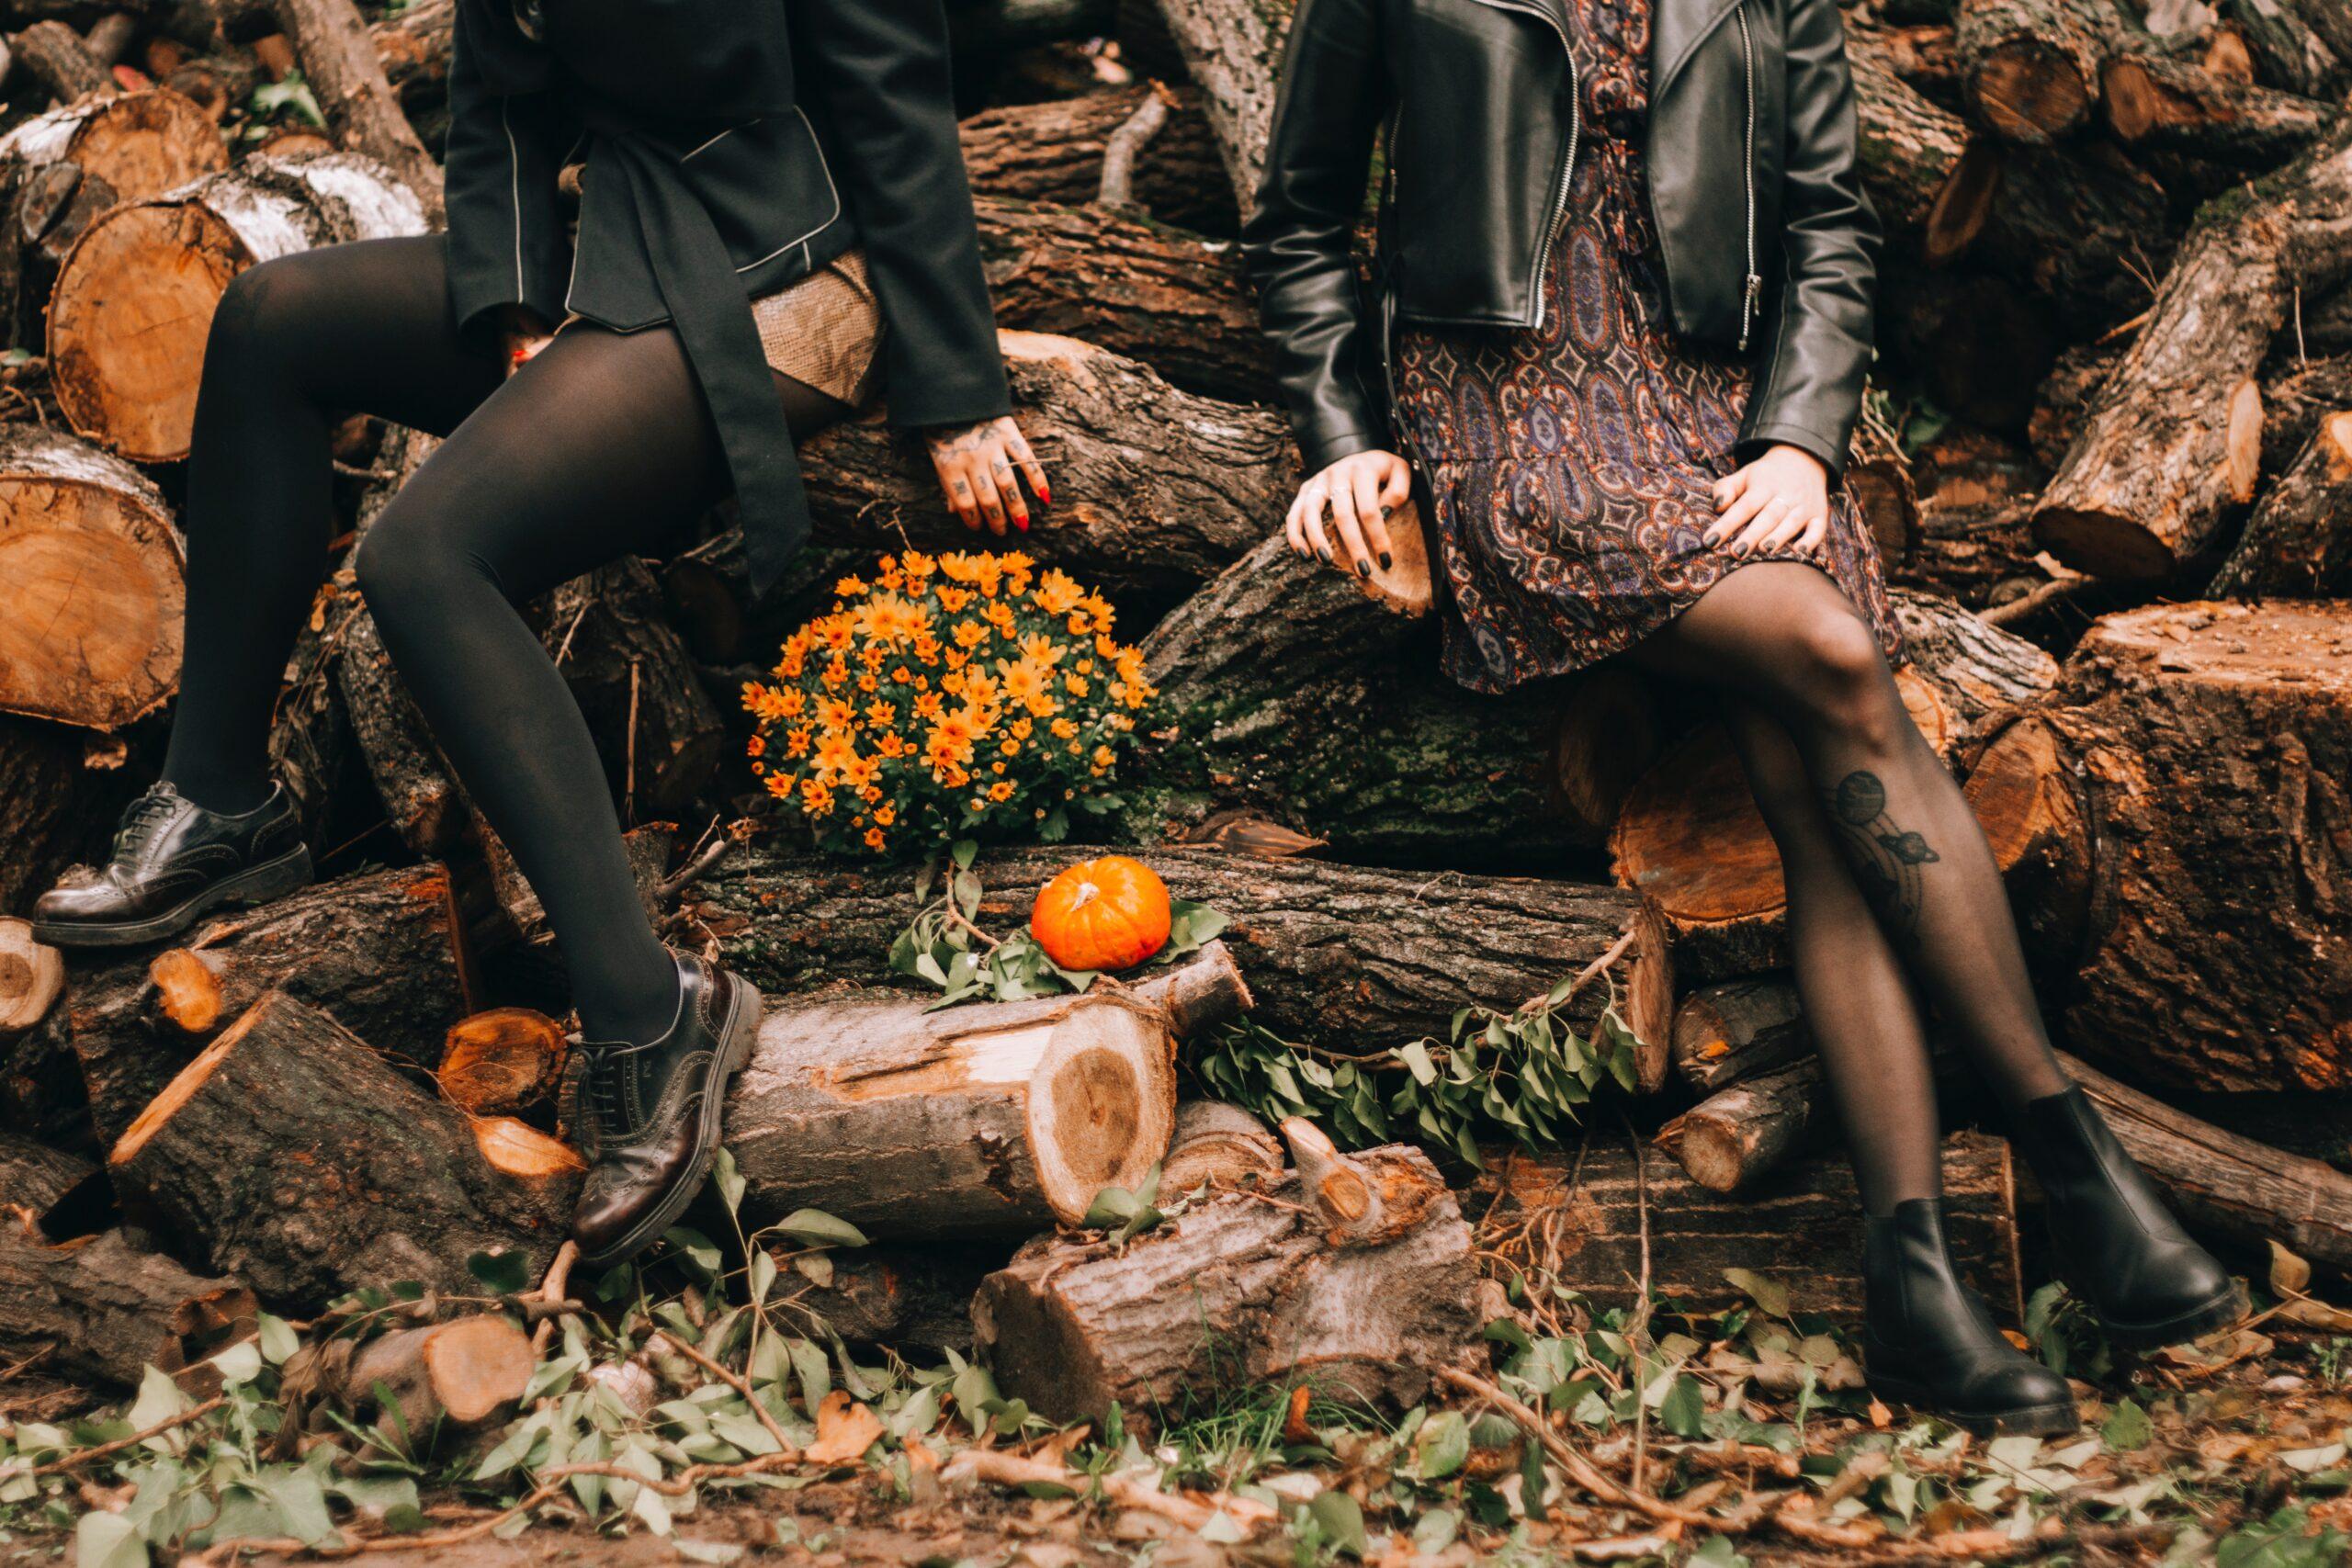 Autumn, women wearing black tights